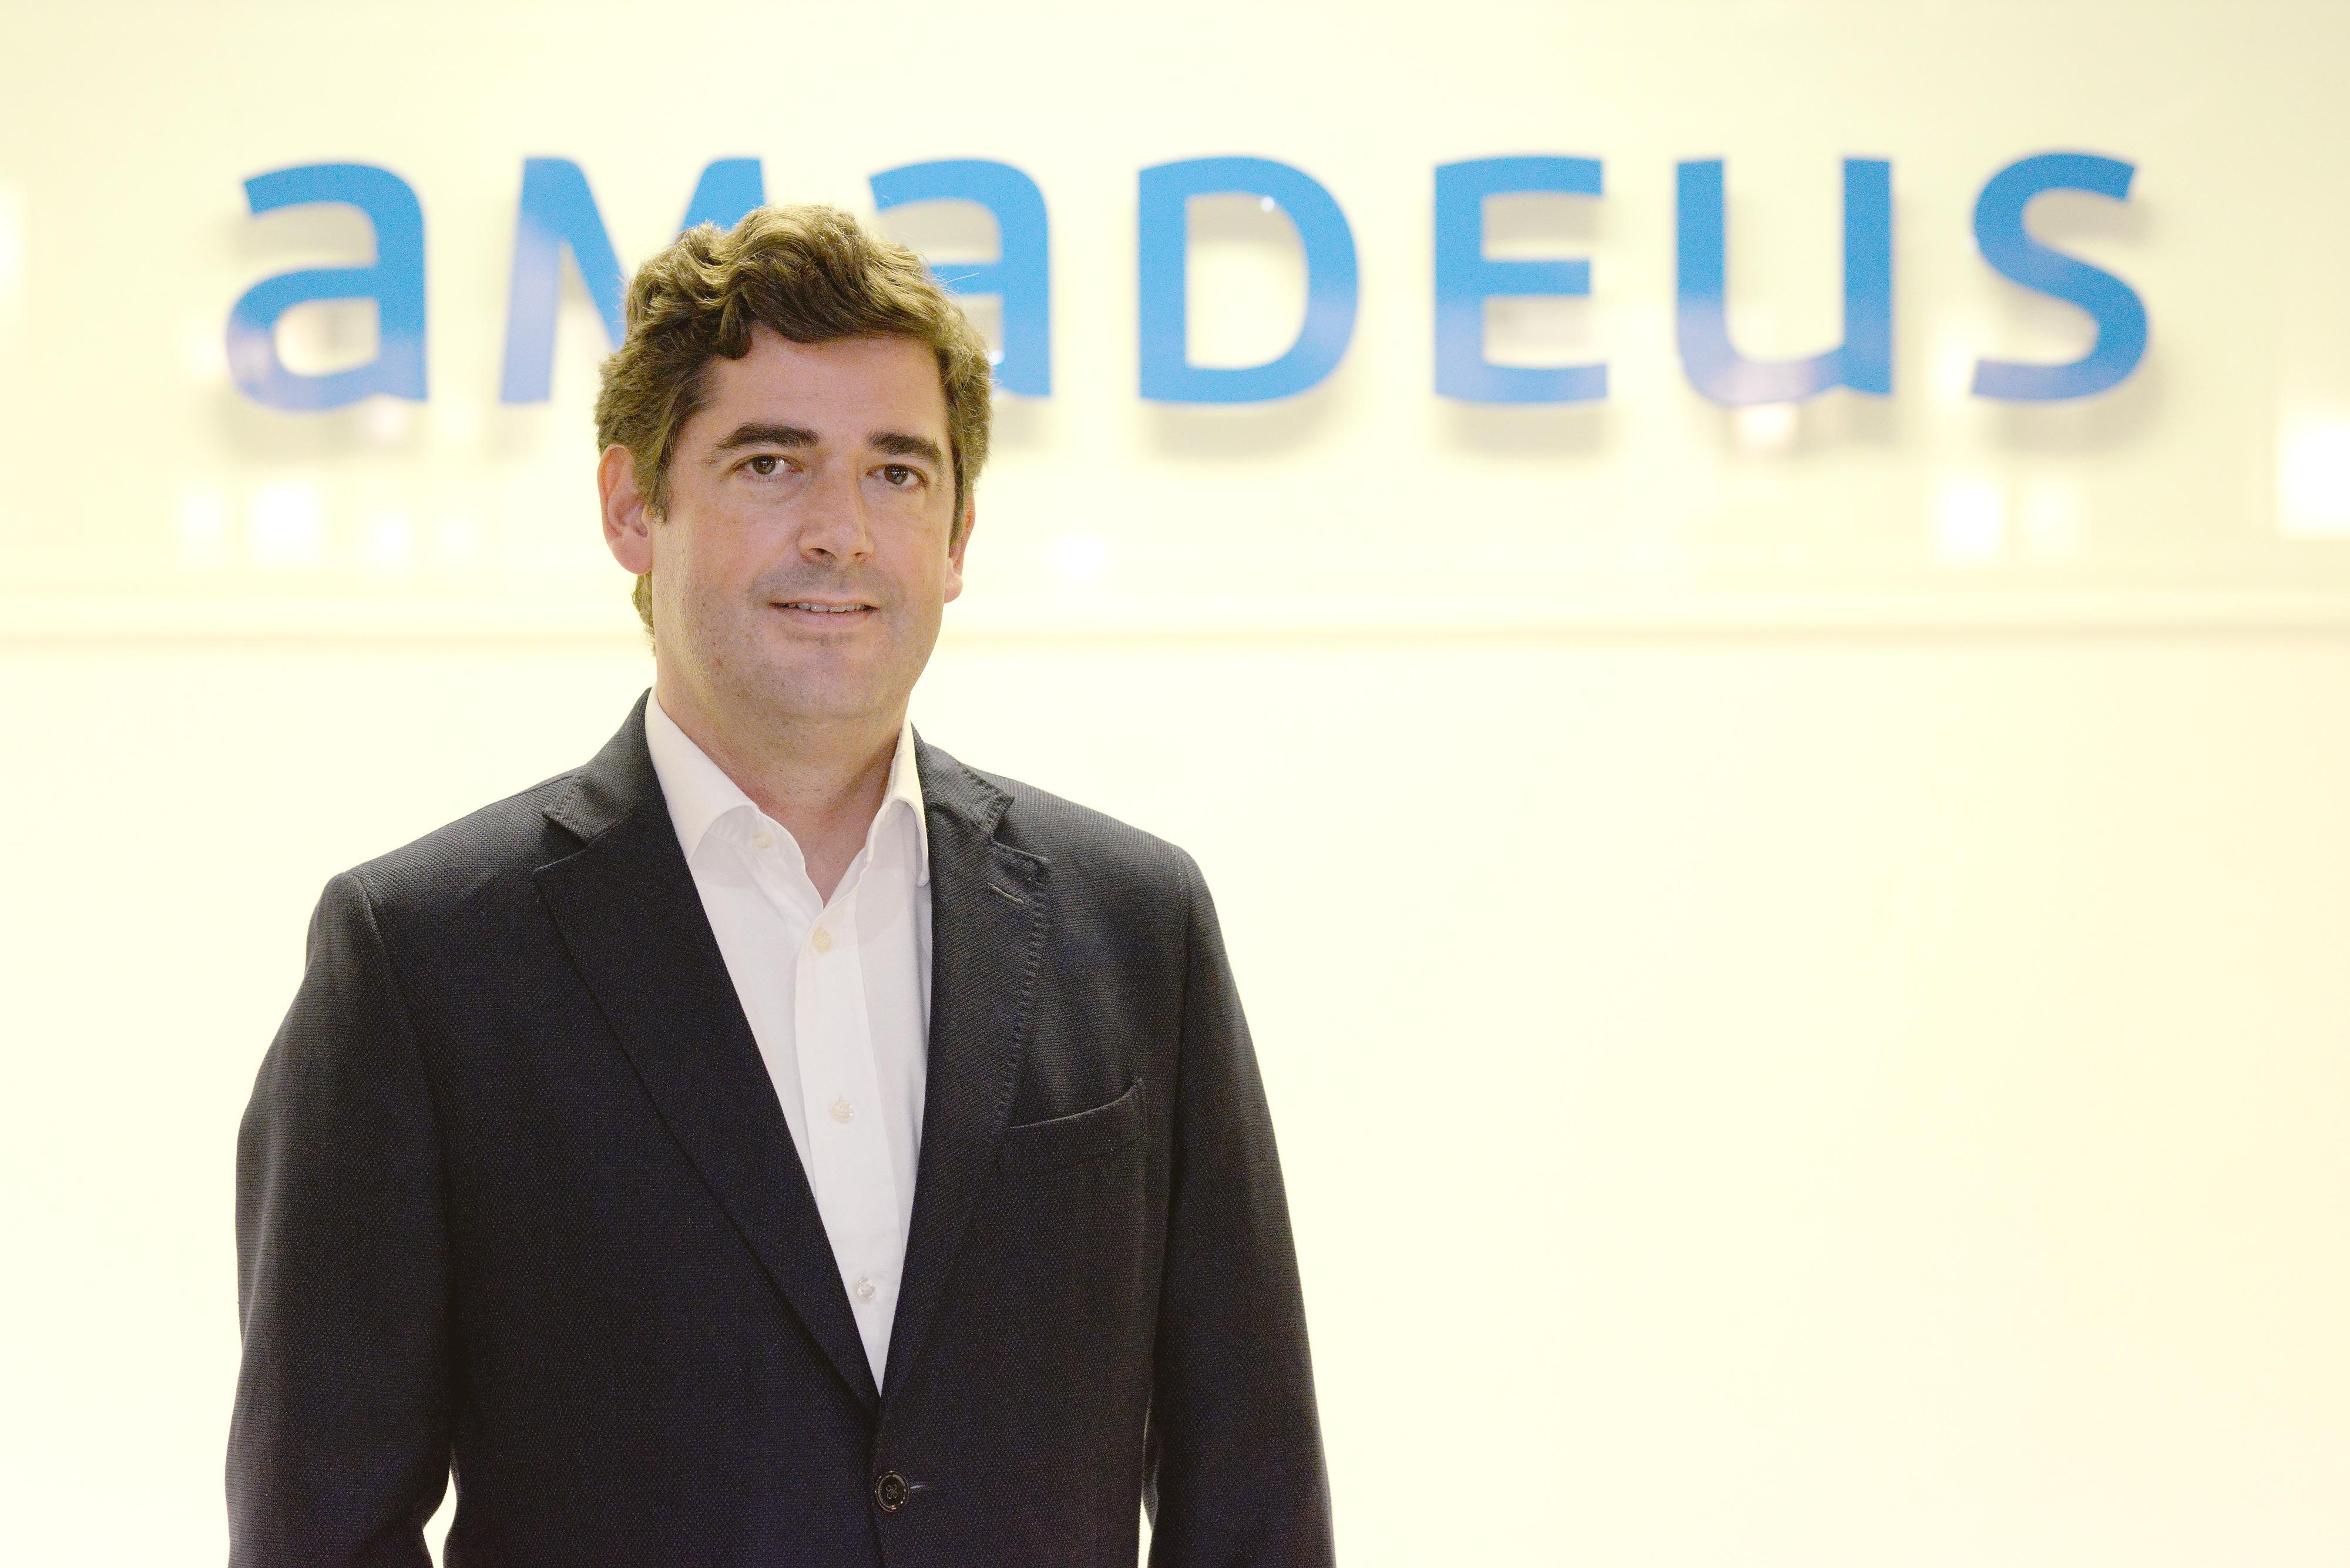 Pablo Alonso, Human Resources Director, APAC, Amadeus